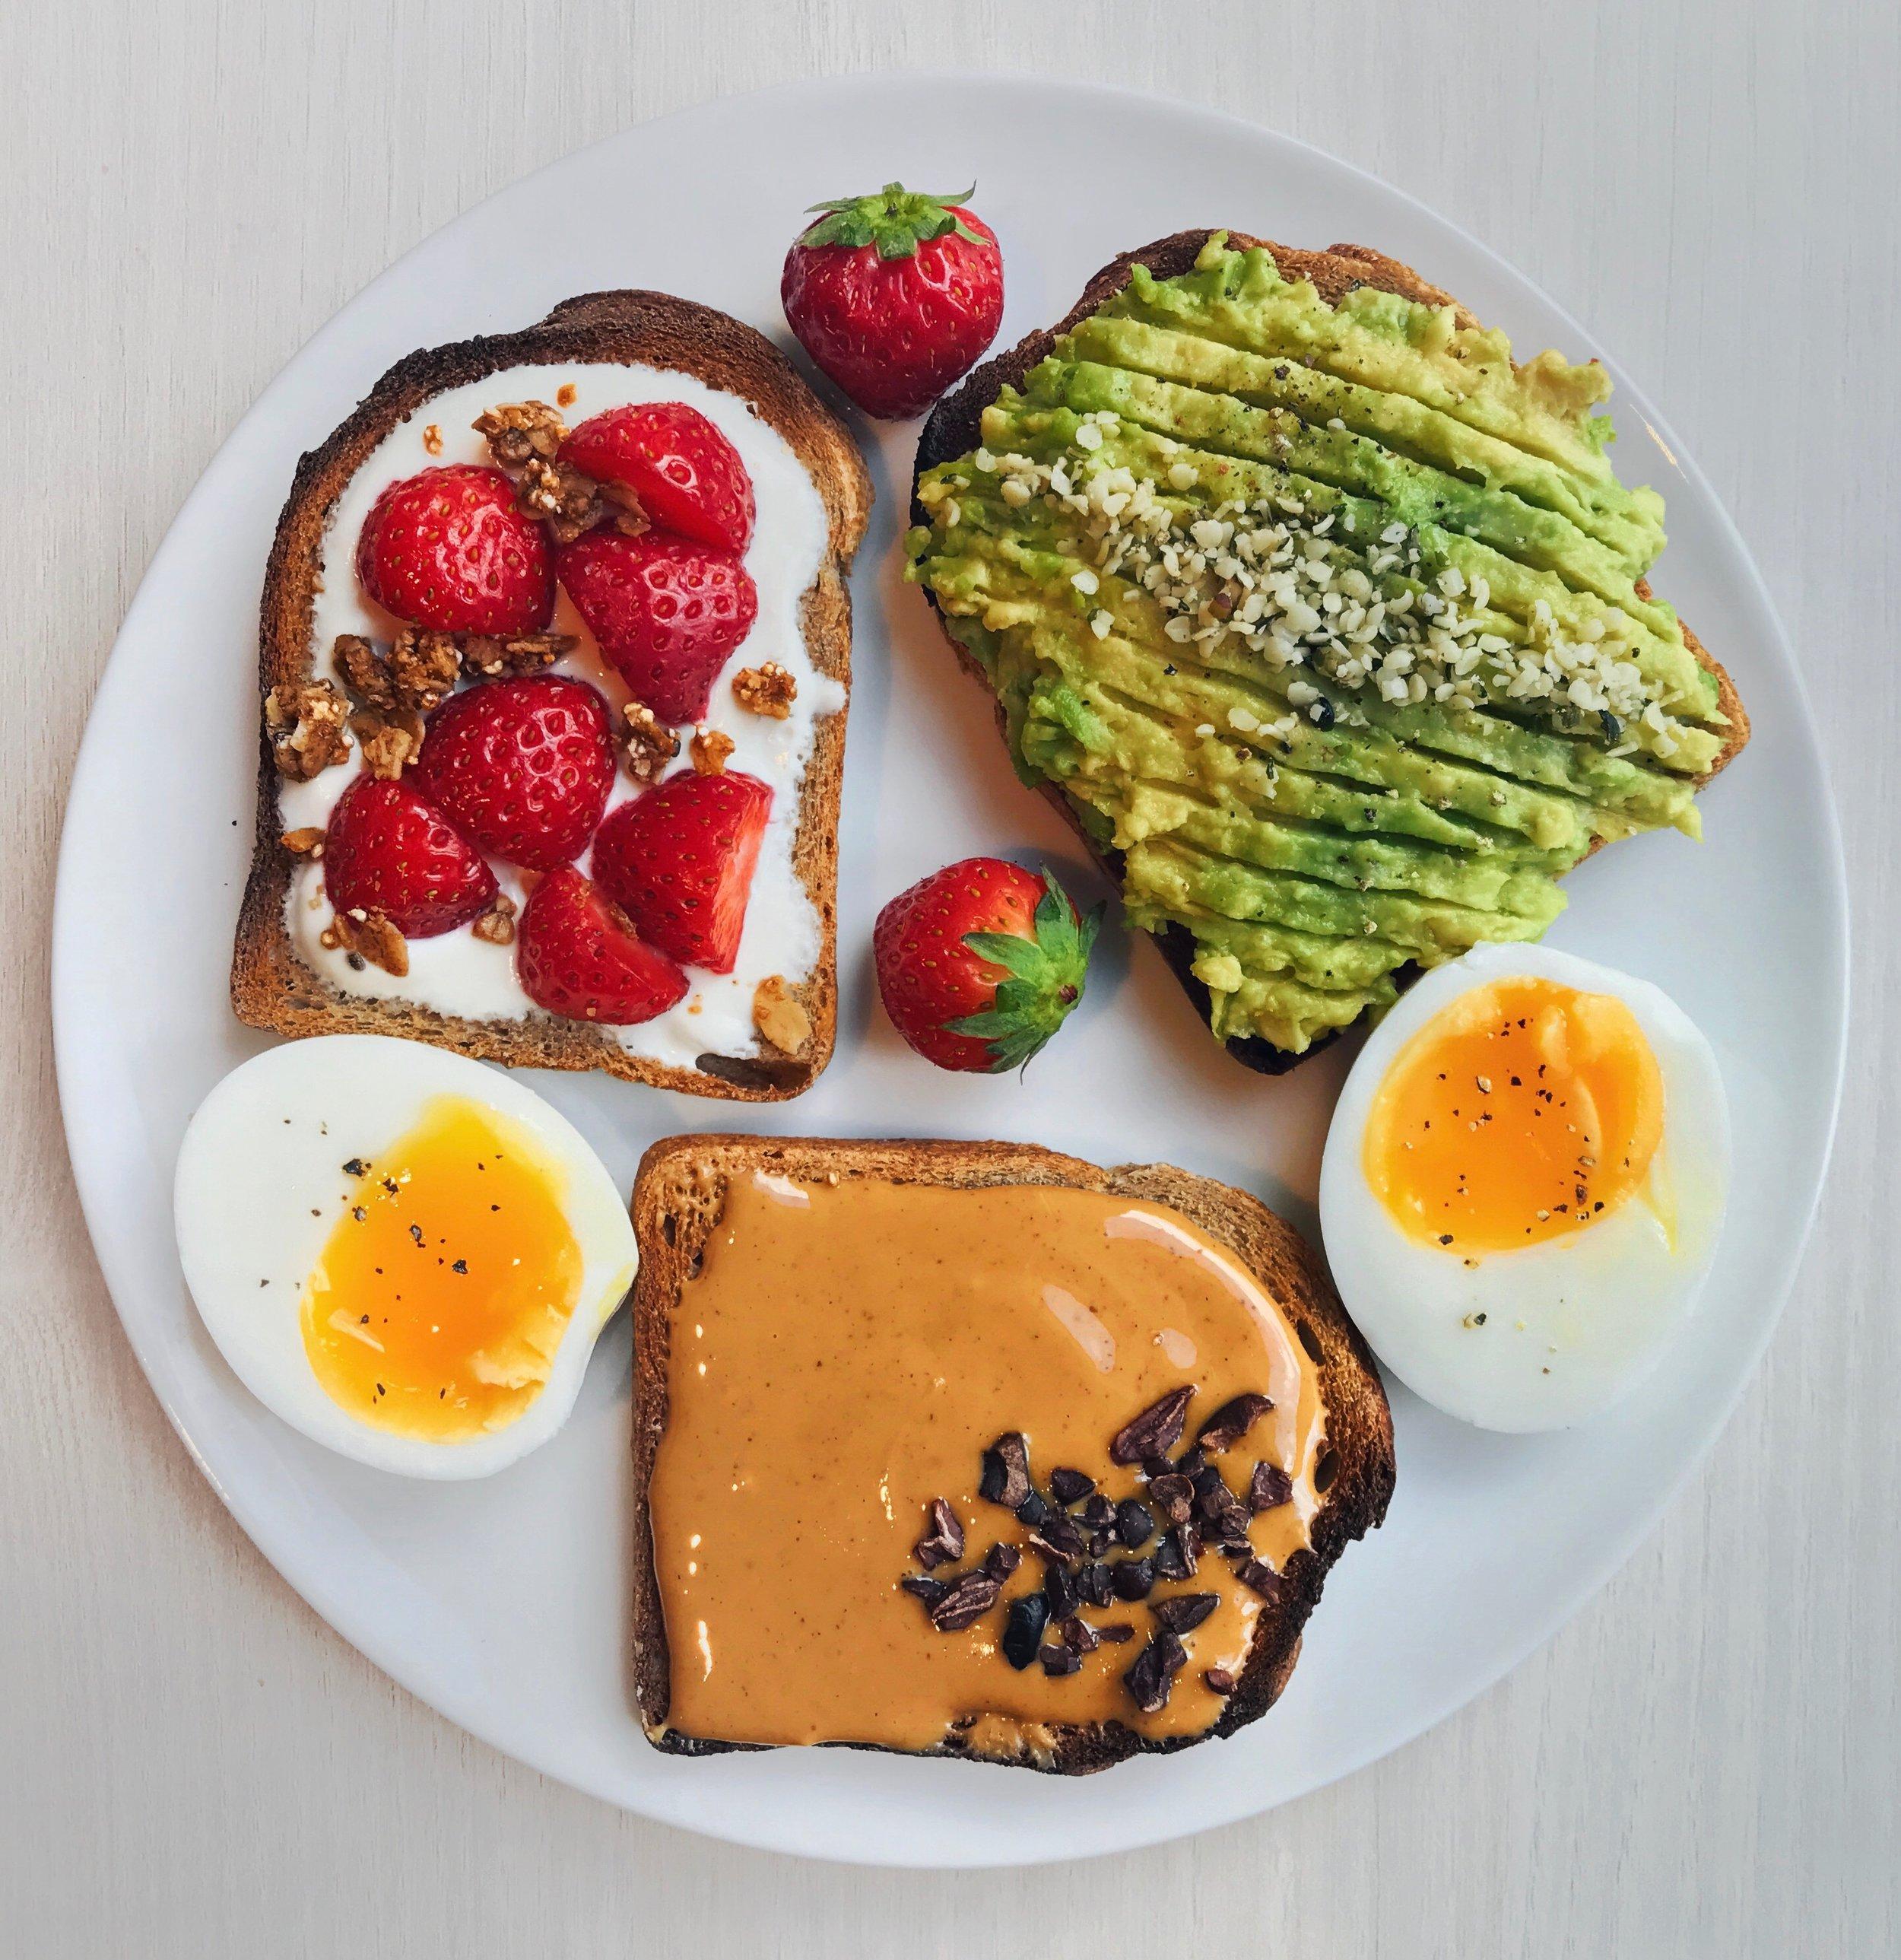 Avocado, Peanut Butter & Greek Yogurt + Strawberry Toasts - Toasted small wholewheat bread topped with 1)@naturalia_magasins_biomashed avocado +@forceultranaturehemp seeds, 2)@crazyrichardspbpeanut butter +@navitasorganicscacao nibs and 3) greek yogurt + vanilla +@driscollsberrystrawberries +@purely_elizabethgranola as well as a soft-boiled egg + black pepper